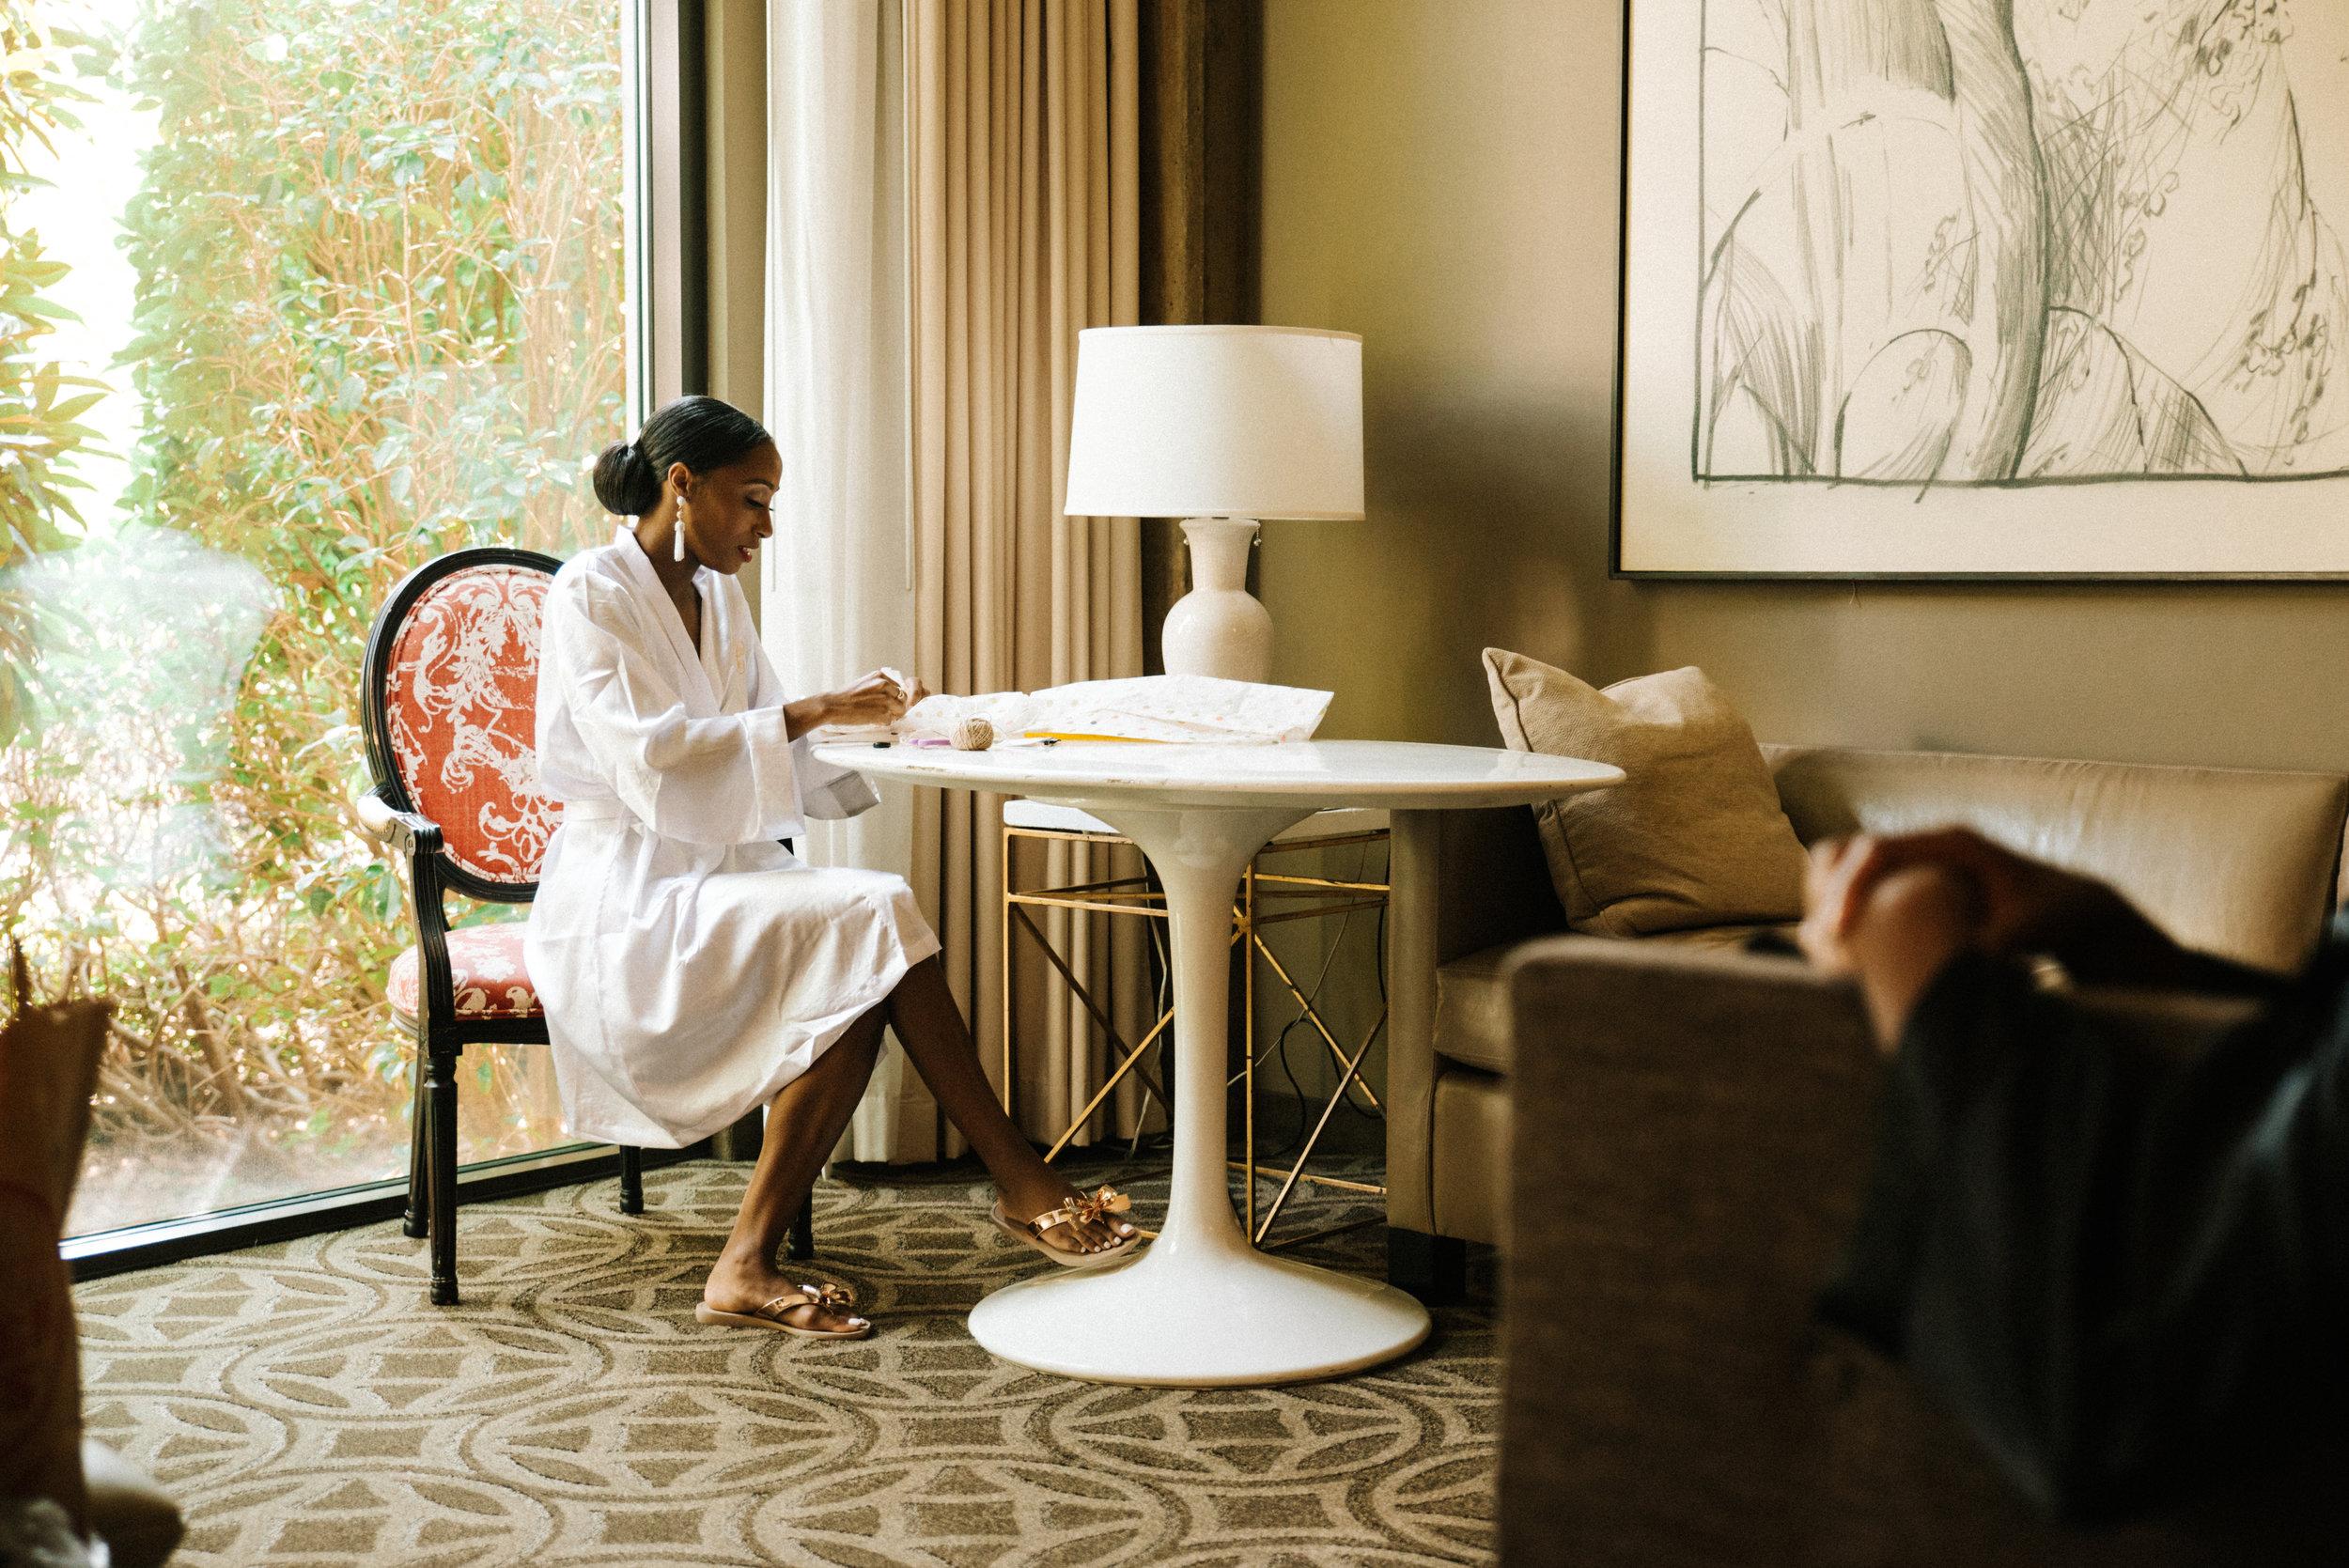 Proximity Hotel, Greensboro, NC. Getting ready photos. North Carolina Wedding Photographer, Marina Rey Photography.